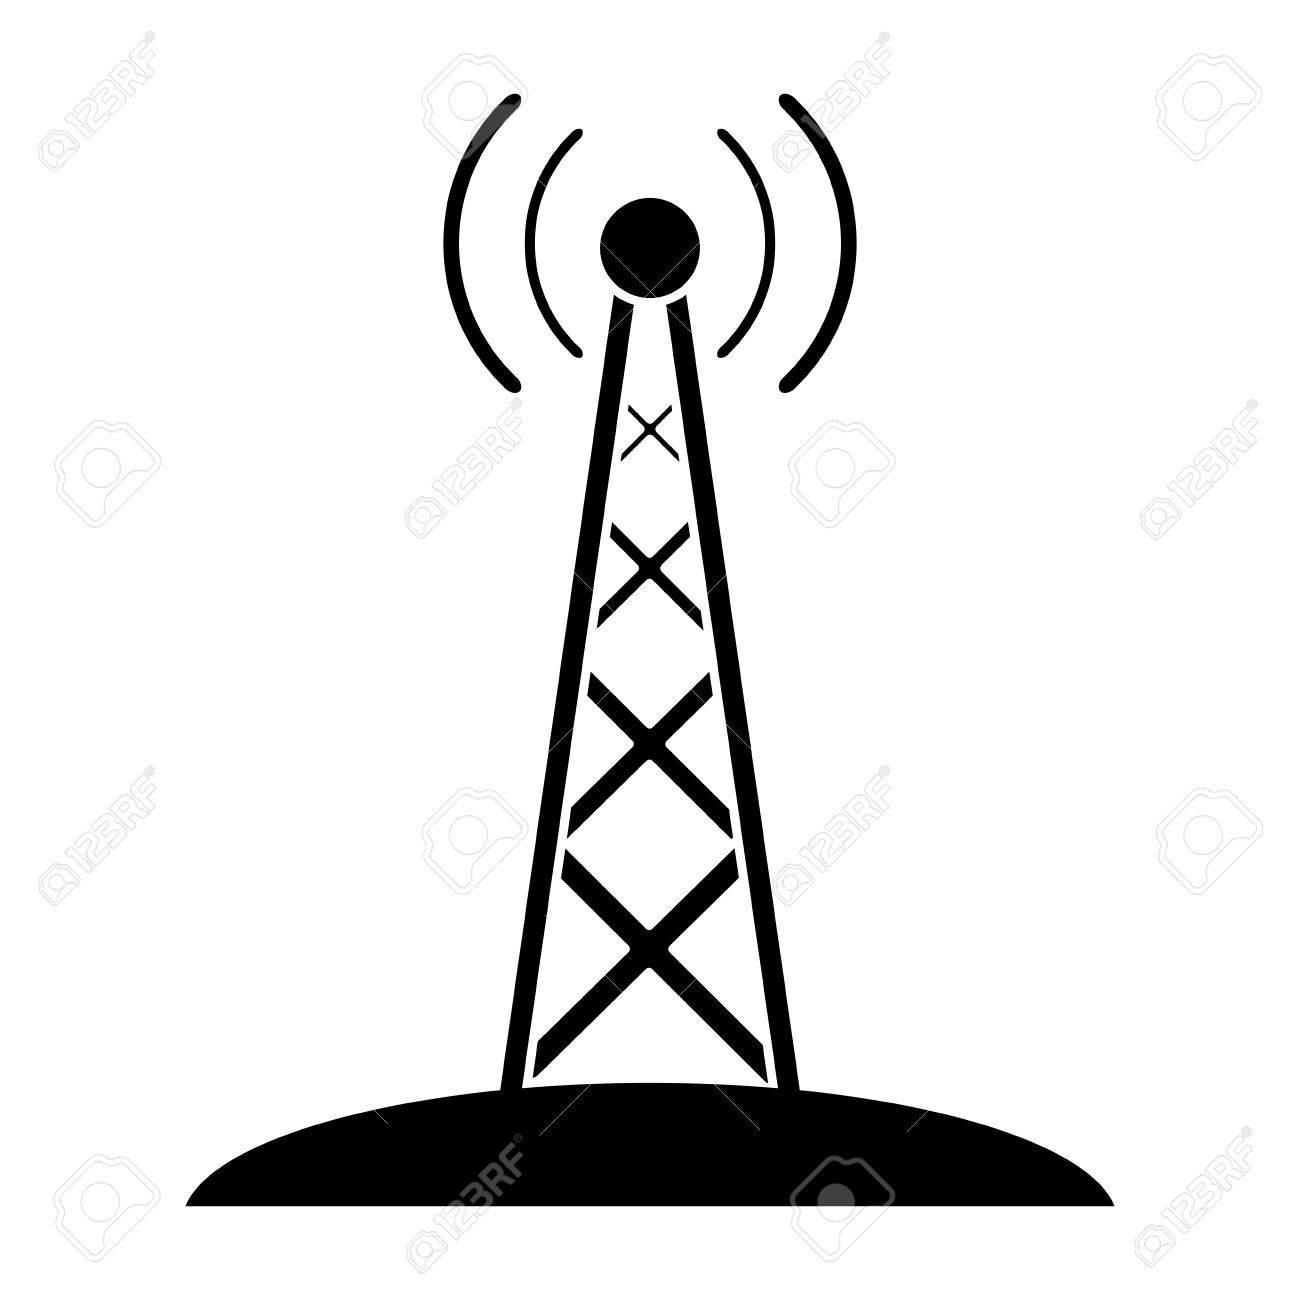 Silueta Transmisión De Antena De Radio Mástil De Comunicación Ilustración Vectorial